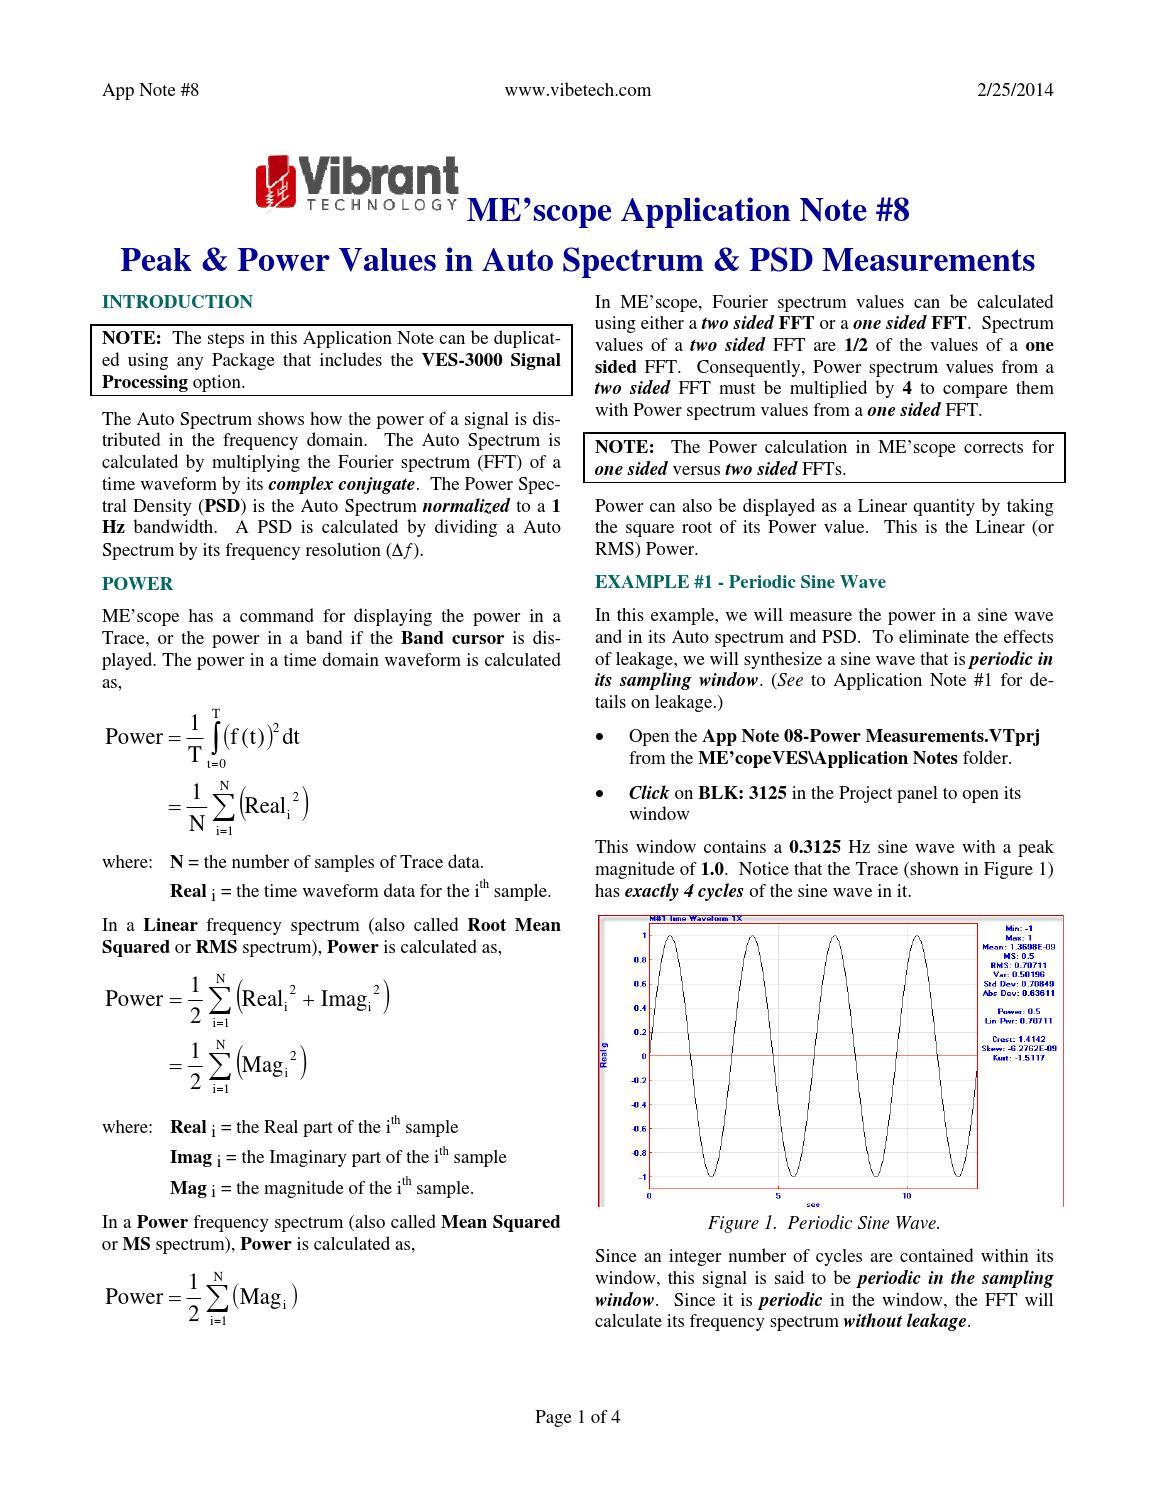 ME'scopeVES Application Note #08 - Peak & Power Values in